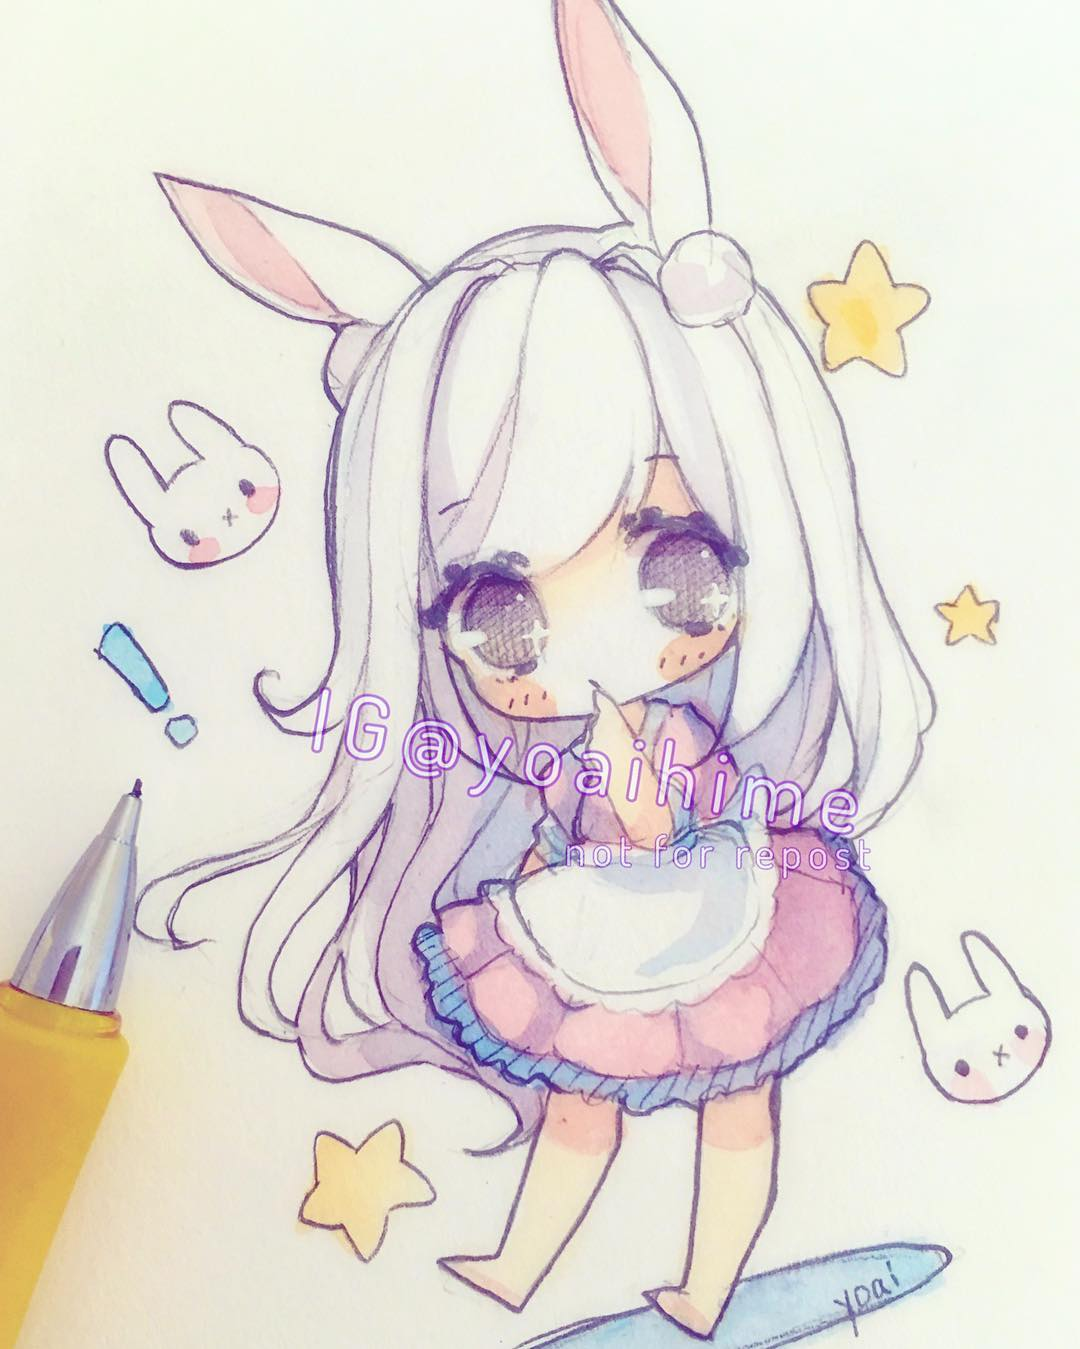 1080x1349 Rabbit Girl (From Instagram)